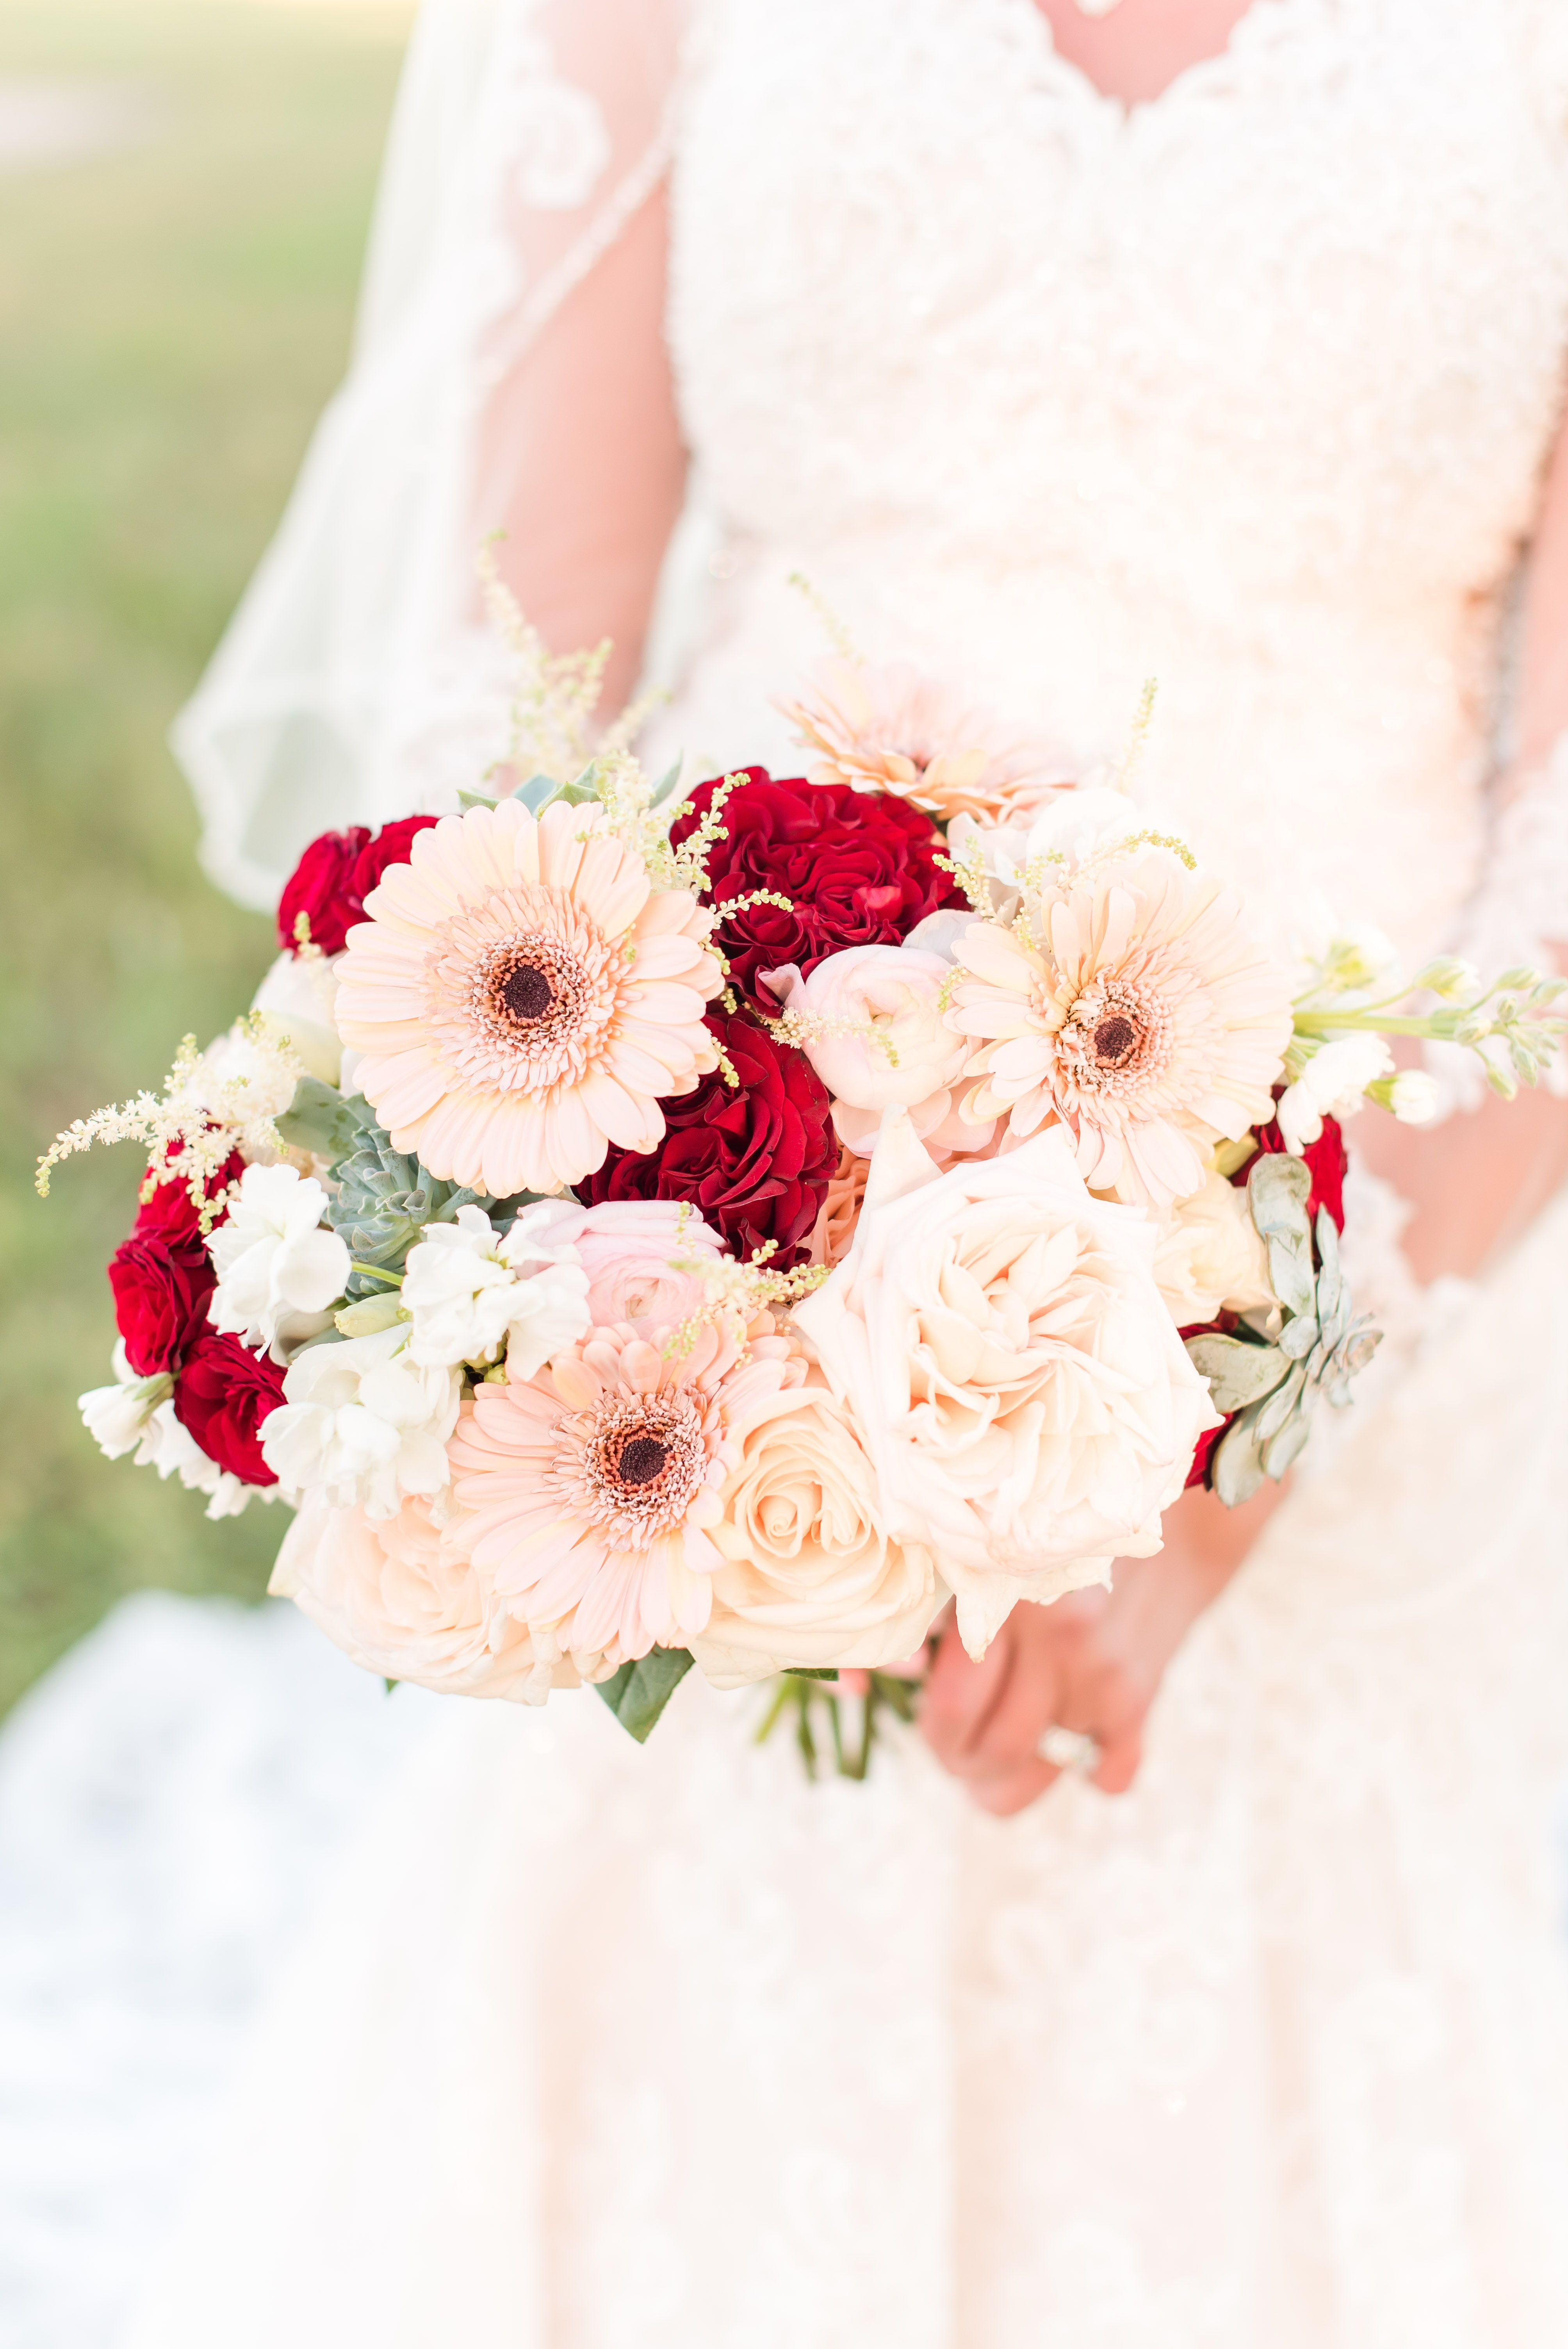 Burgundy and rose gold wedding in 2020 fall wedding